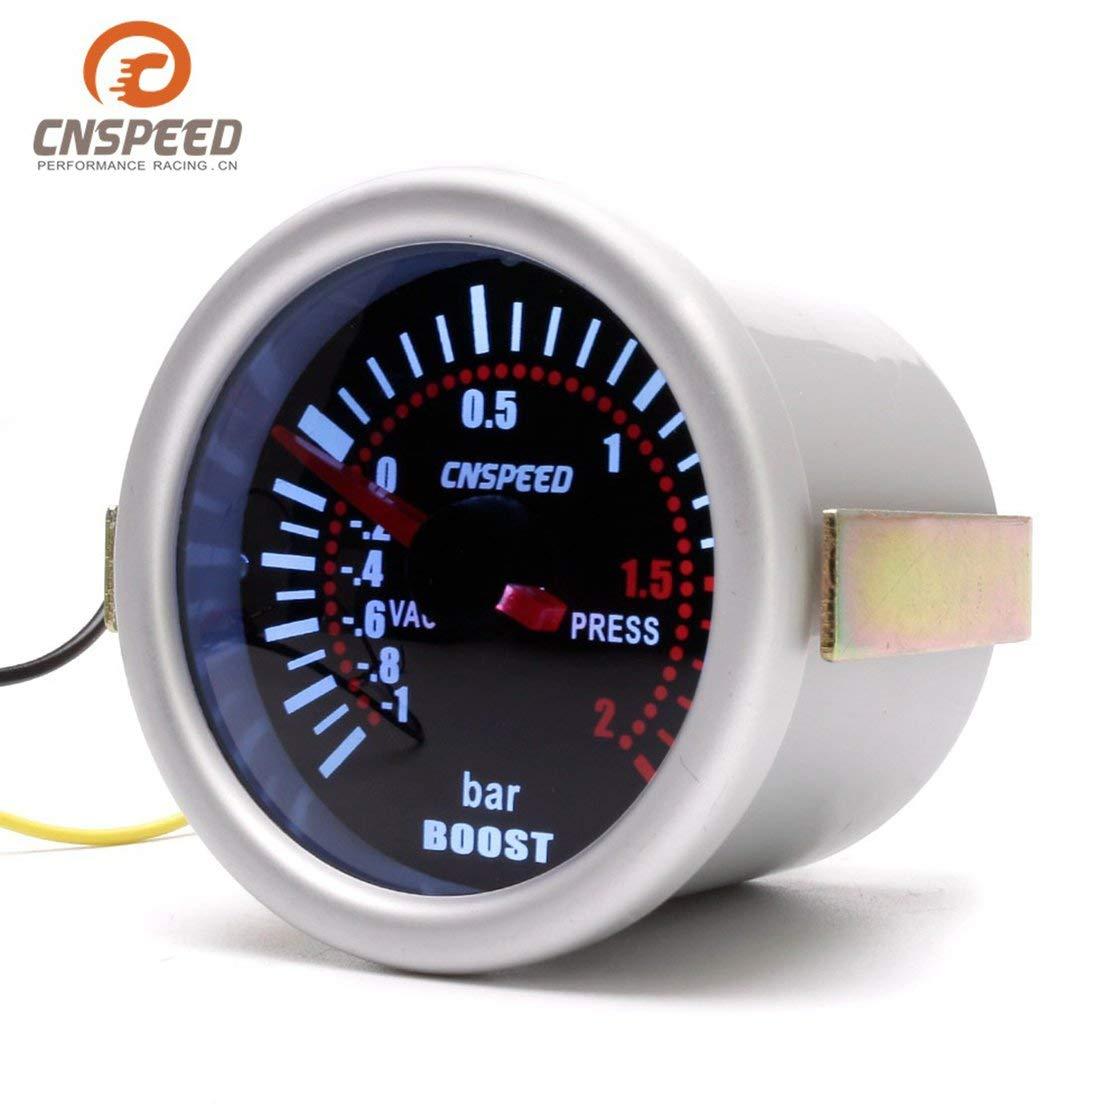 CNSPEED YC101310 Digitale Universale 52mm Car Turbo Boost Vacuum -1~2 BAR Calibro Pressione Manometro Puntatore Contatore di fumo Len LED BlackPJenny